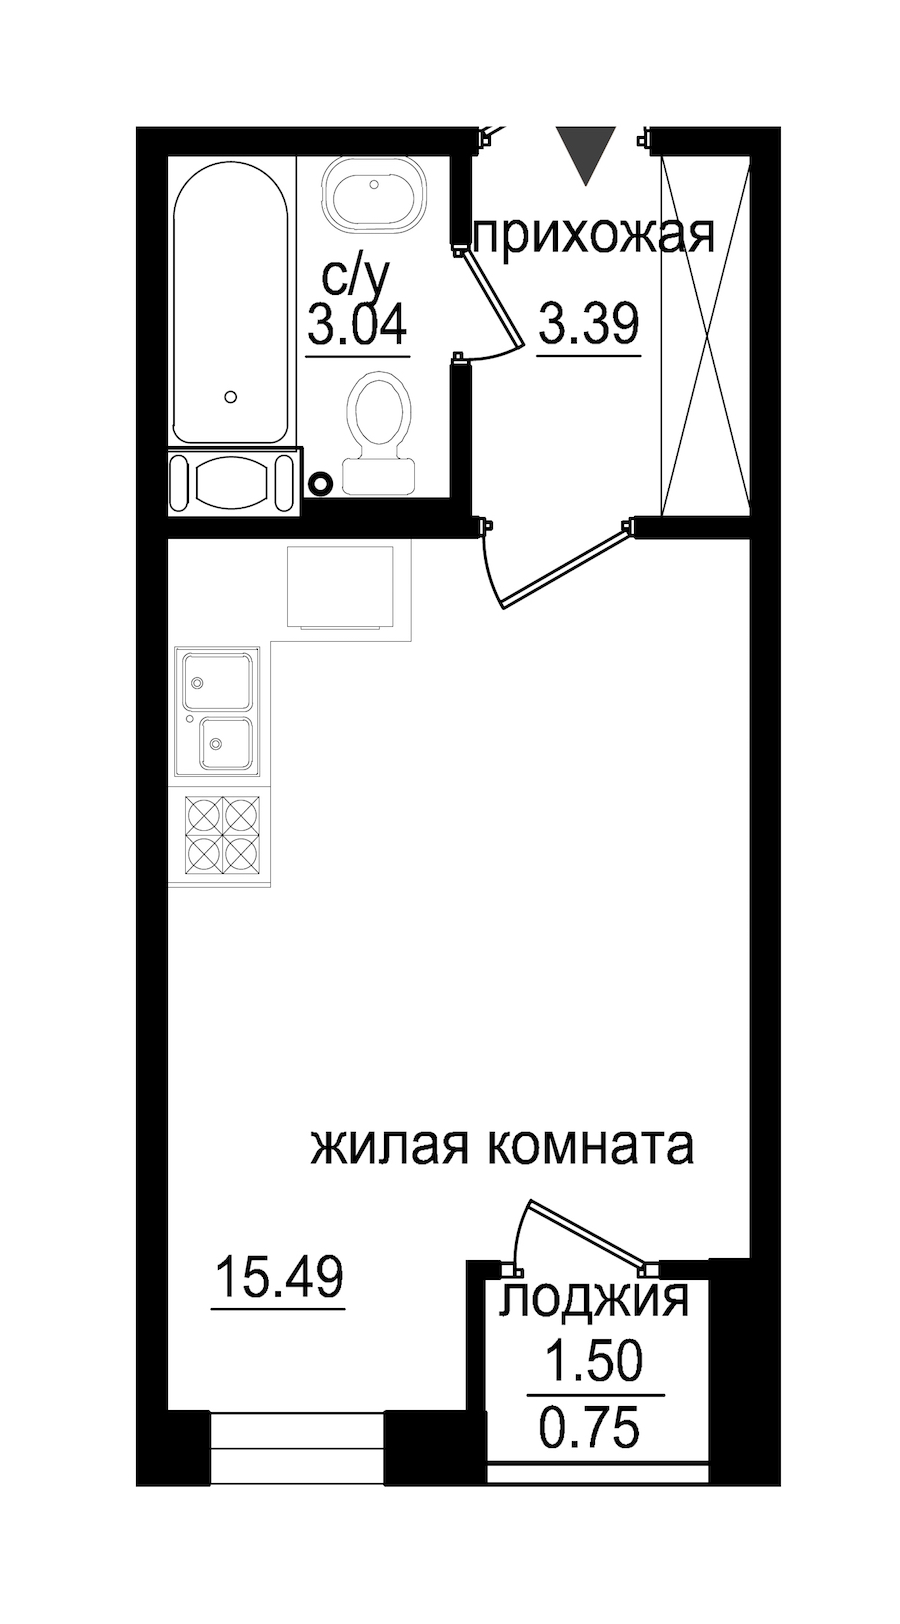 Студия 22 м<sup>2</sup> на 4 этаже